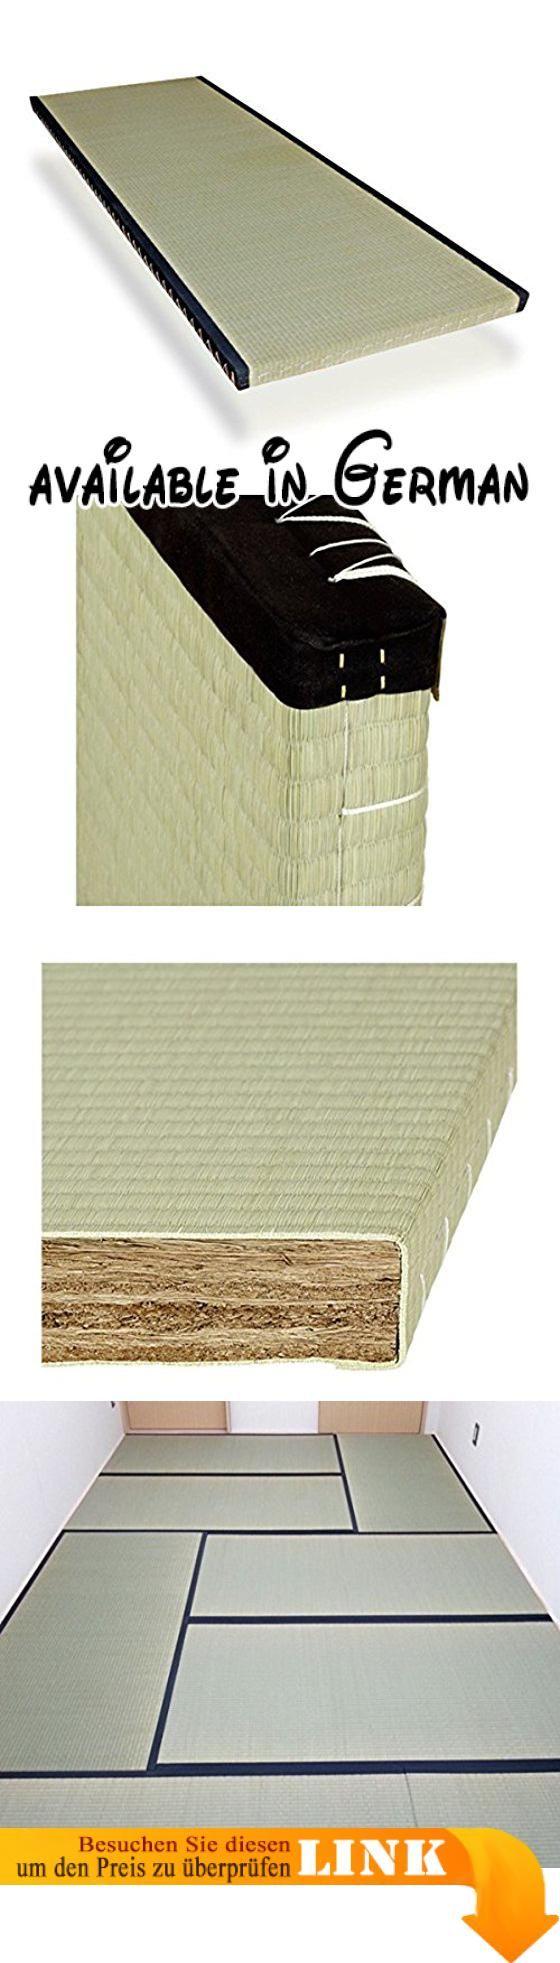 Japanische Bodenmatten b0776zrm4c tatami standard japanische matte bodenmatte